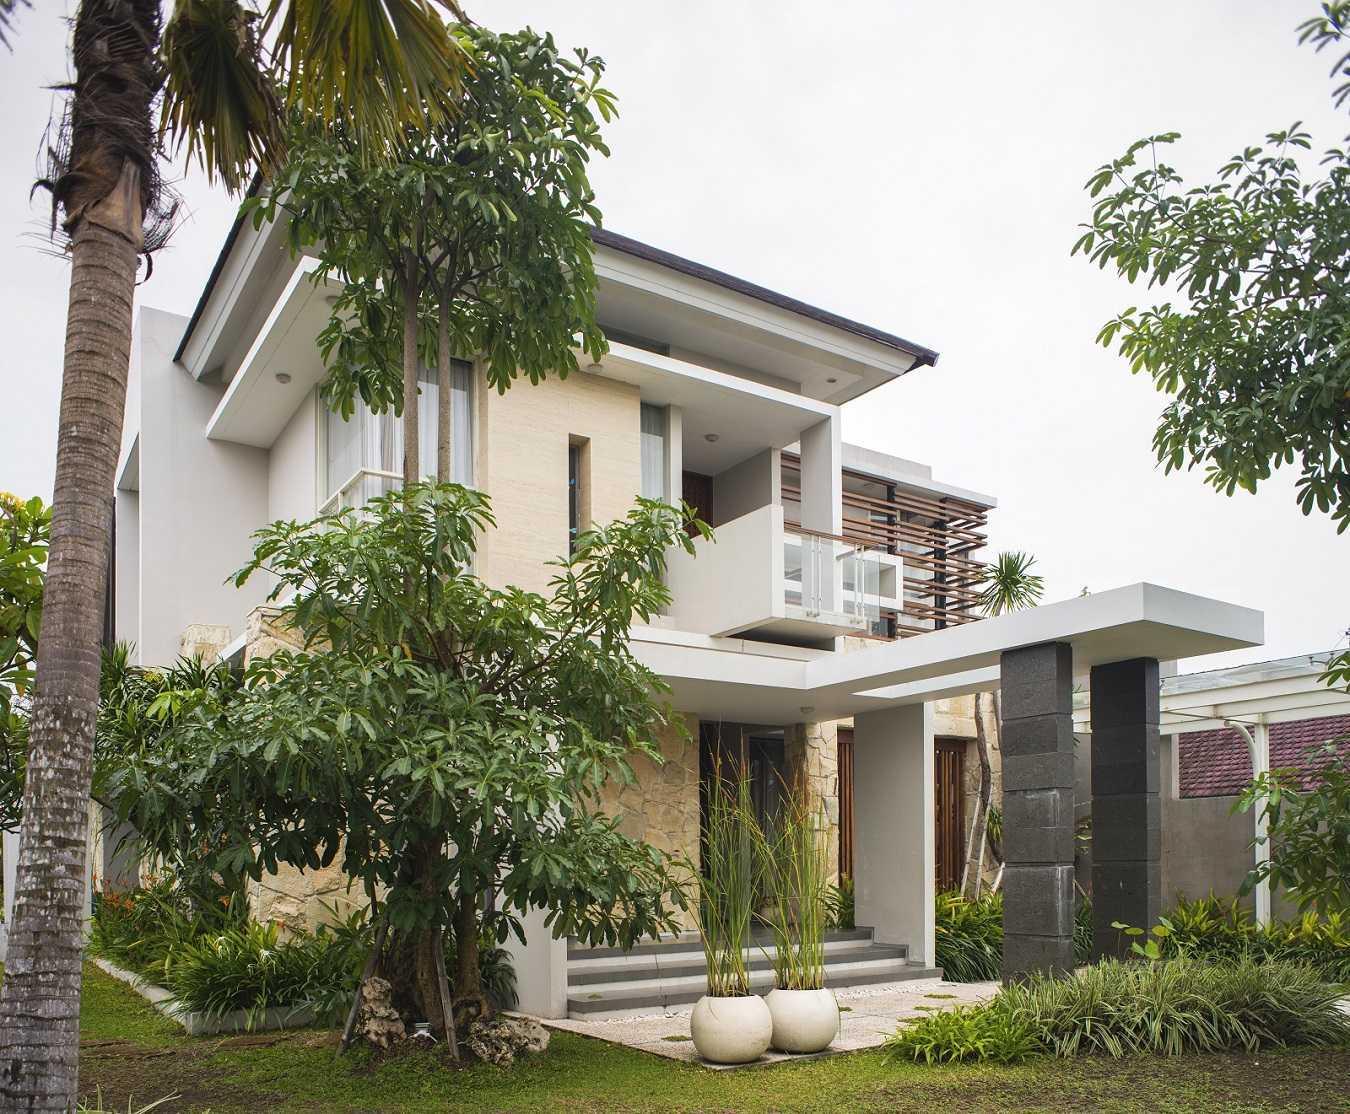 Satuvista Architect Rumah Tropis Hook Kabupaten Jombang, Jawa Timur, Indonesia Jawa Timur, Indonesia Facade View  48711